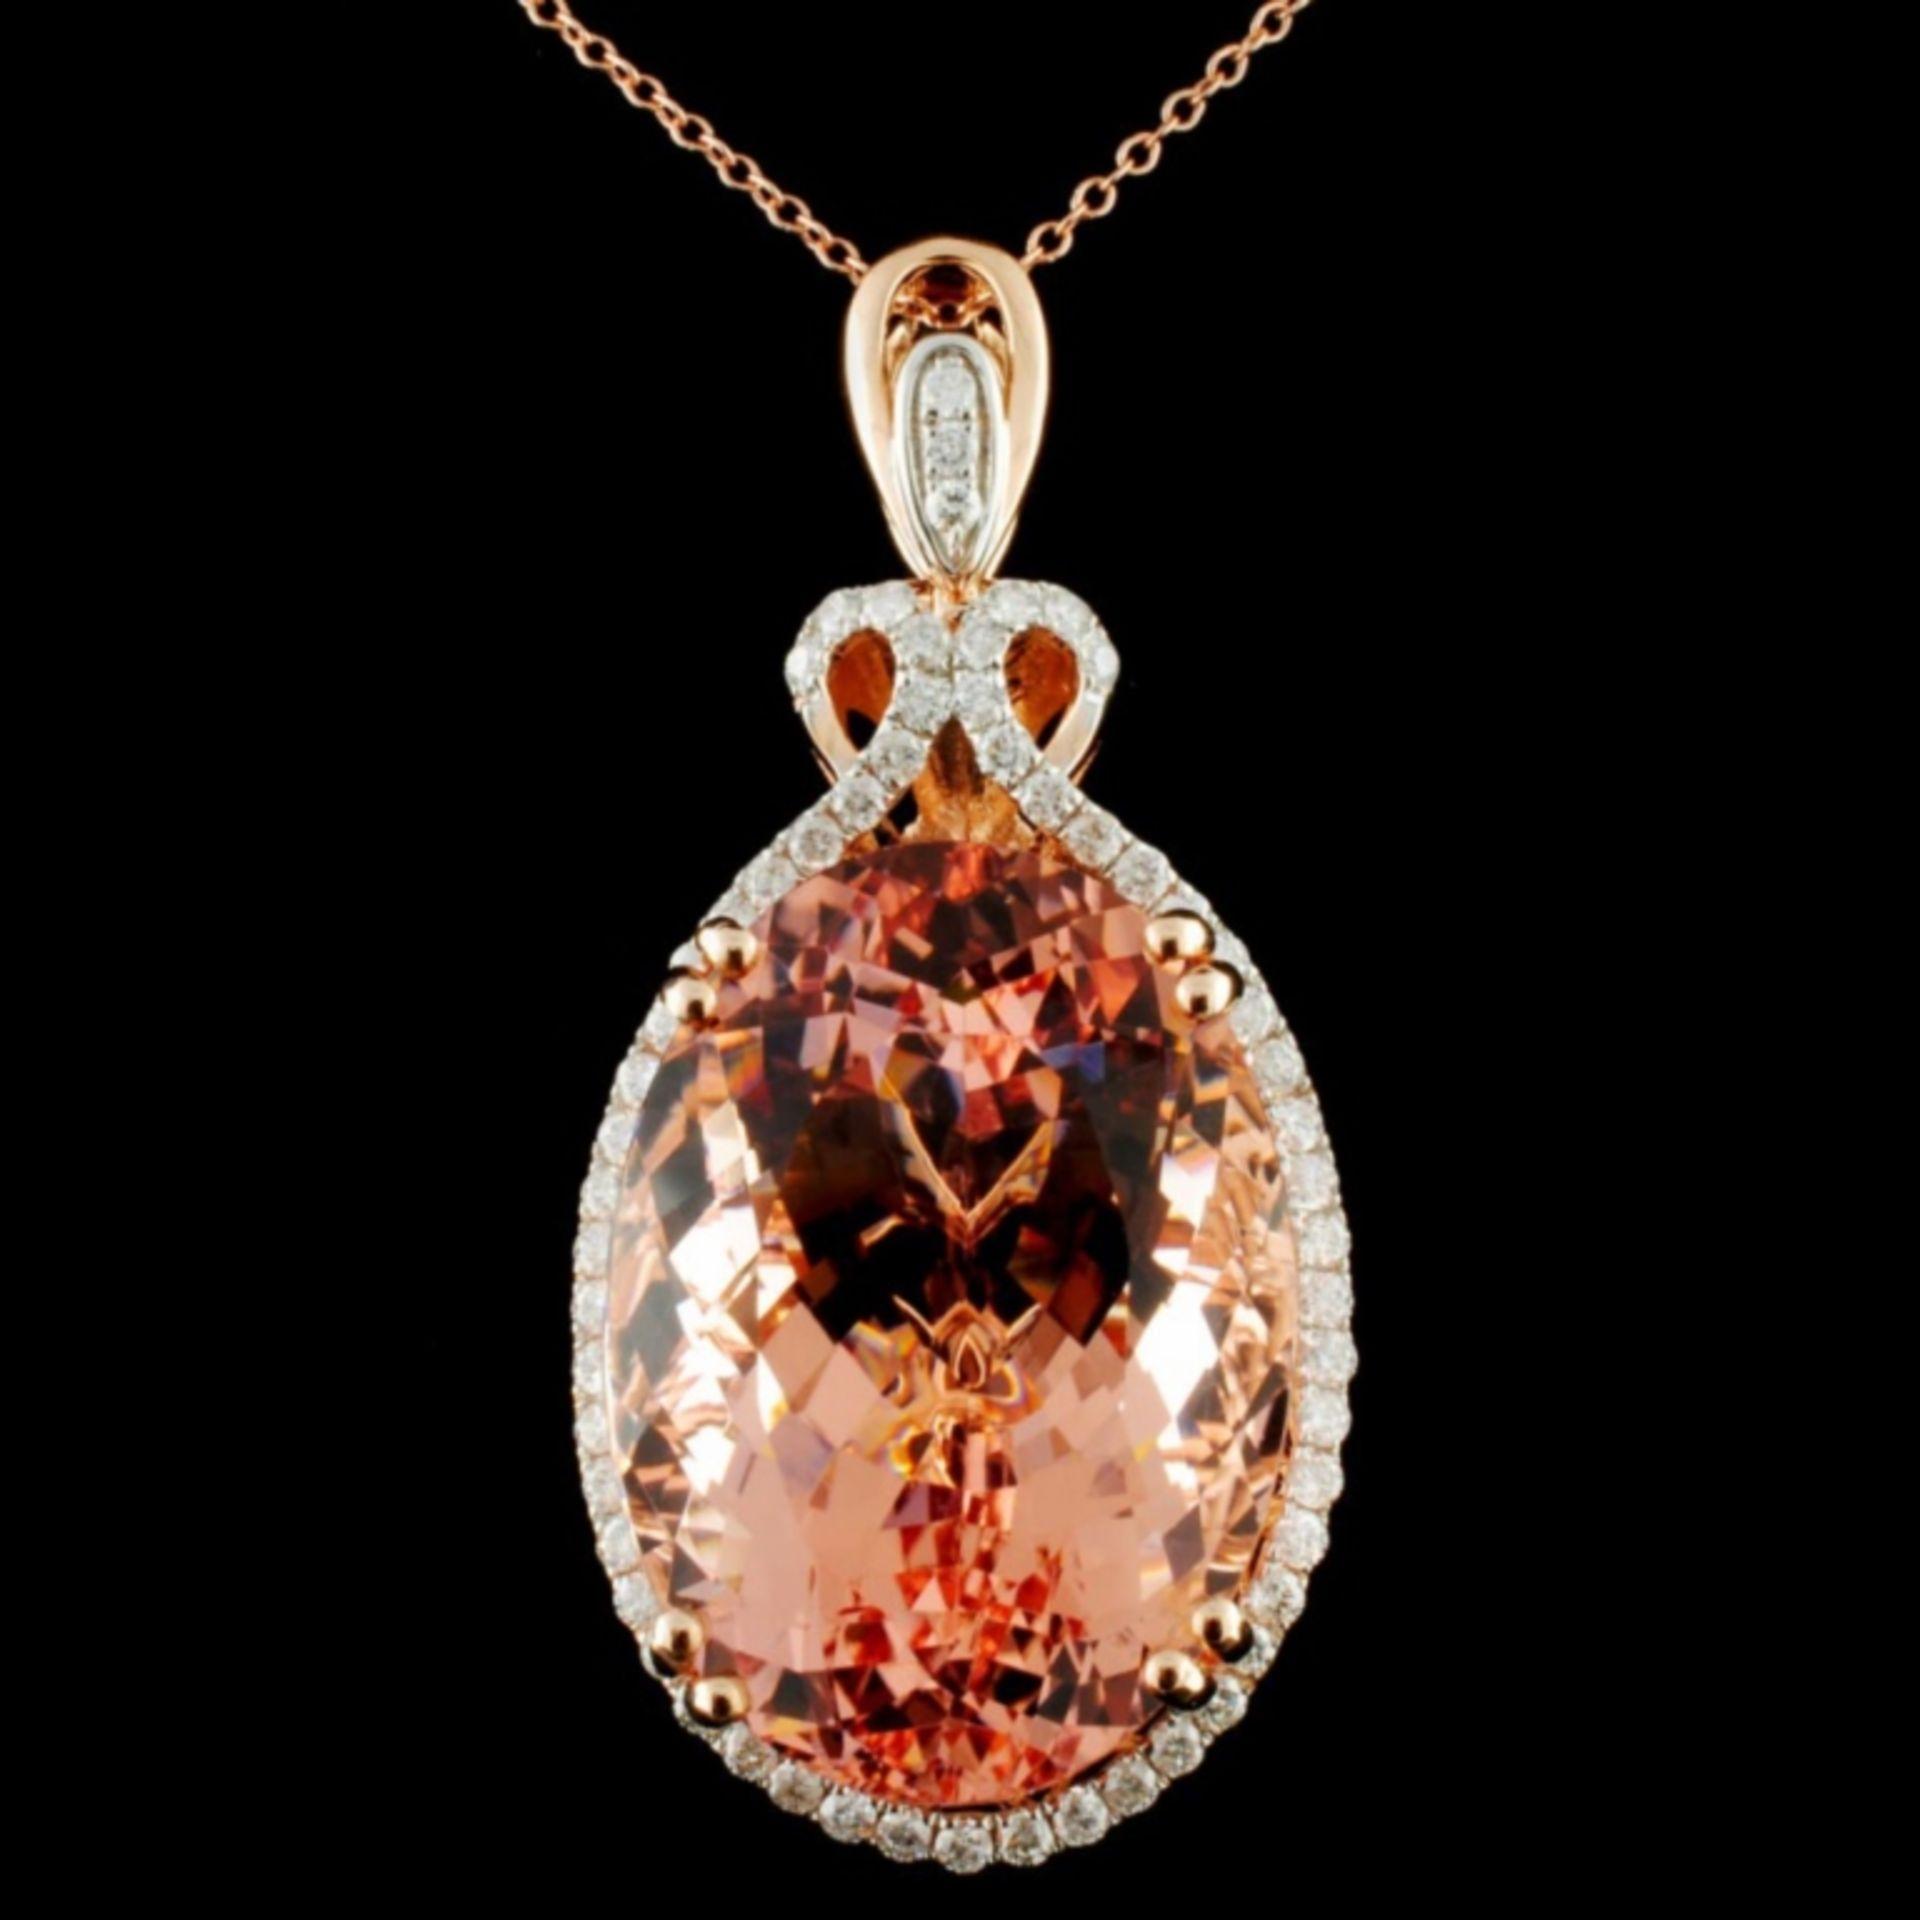 14K Gold 38.30ct Morganite & 0.80ctw Diamond Penda